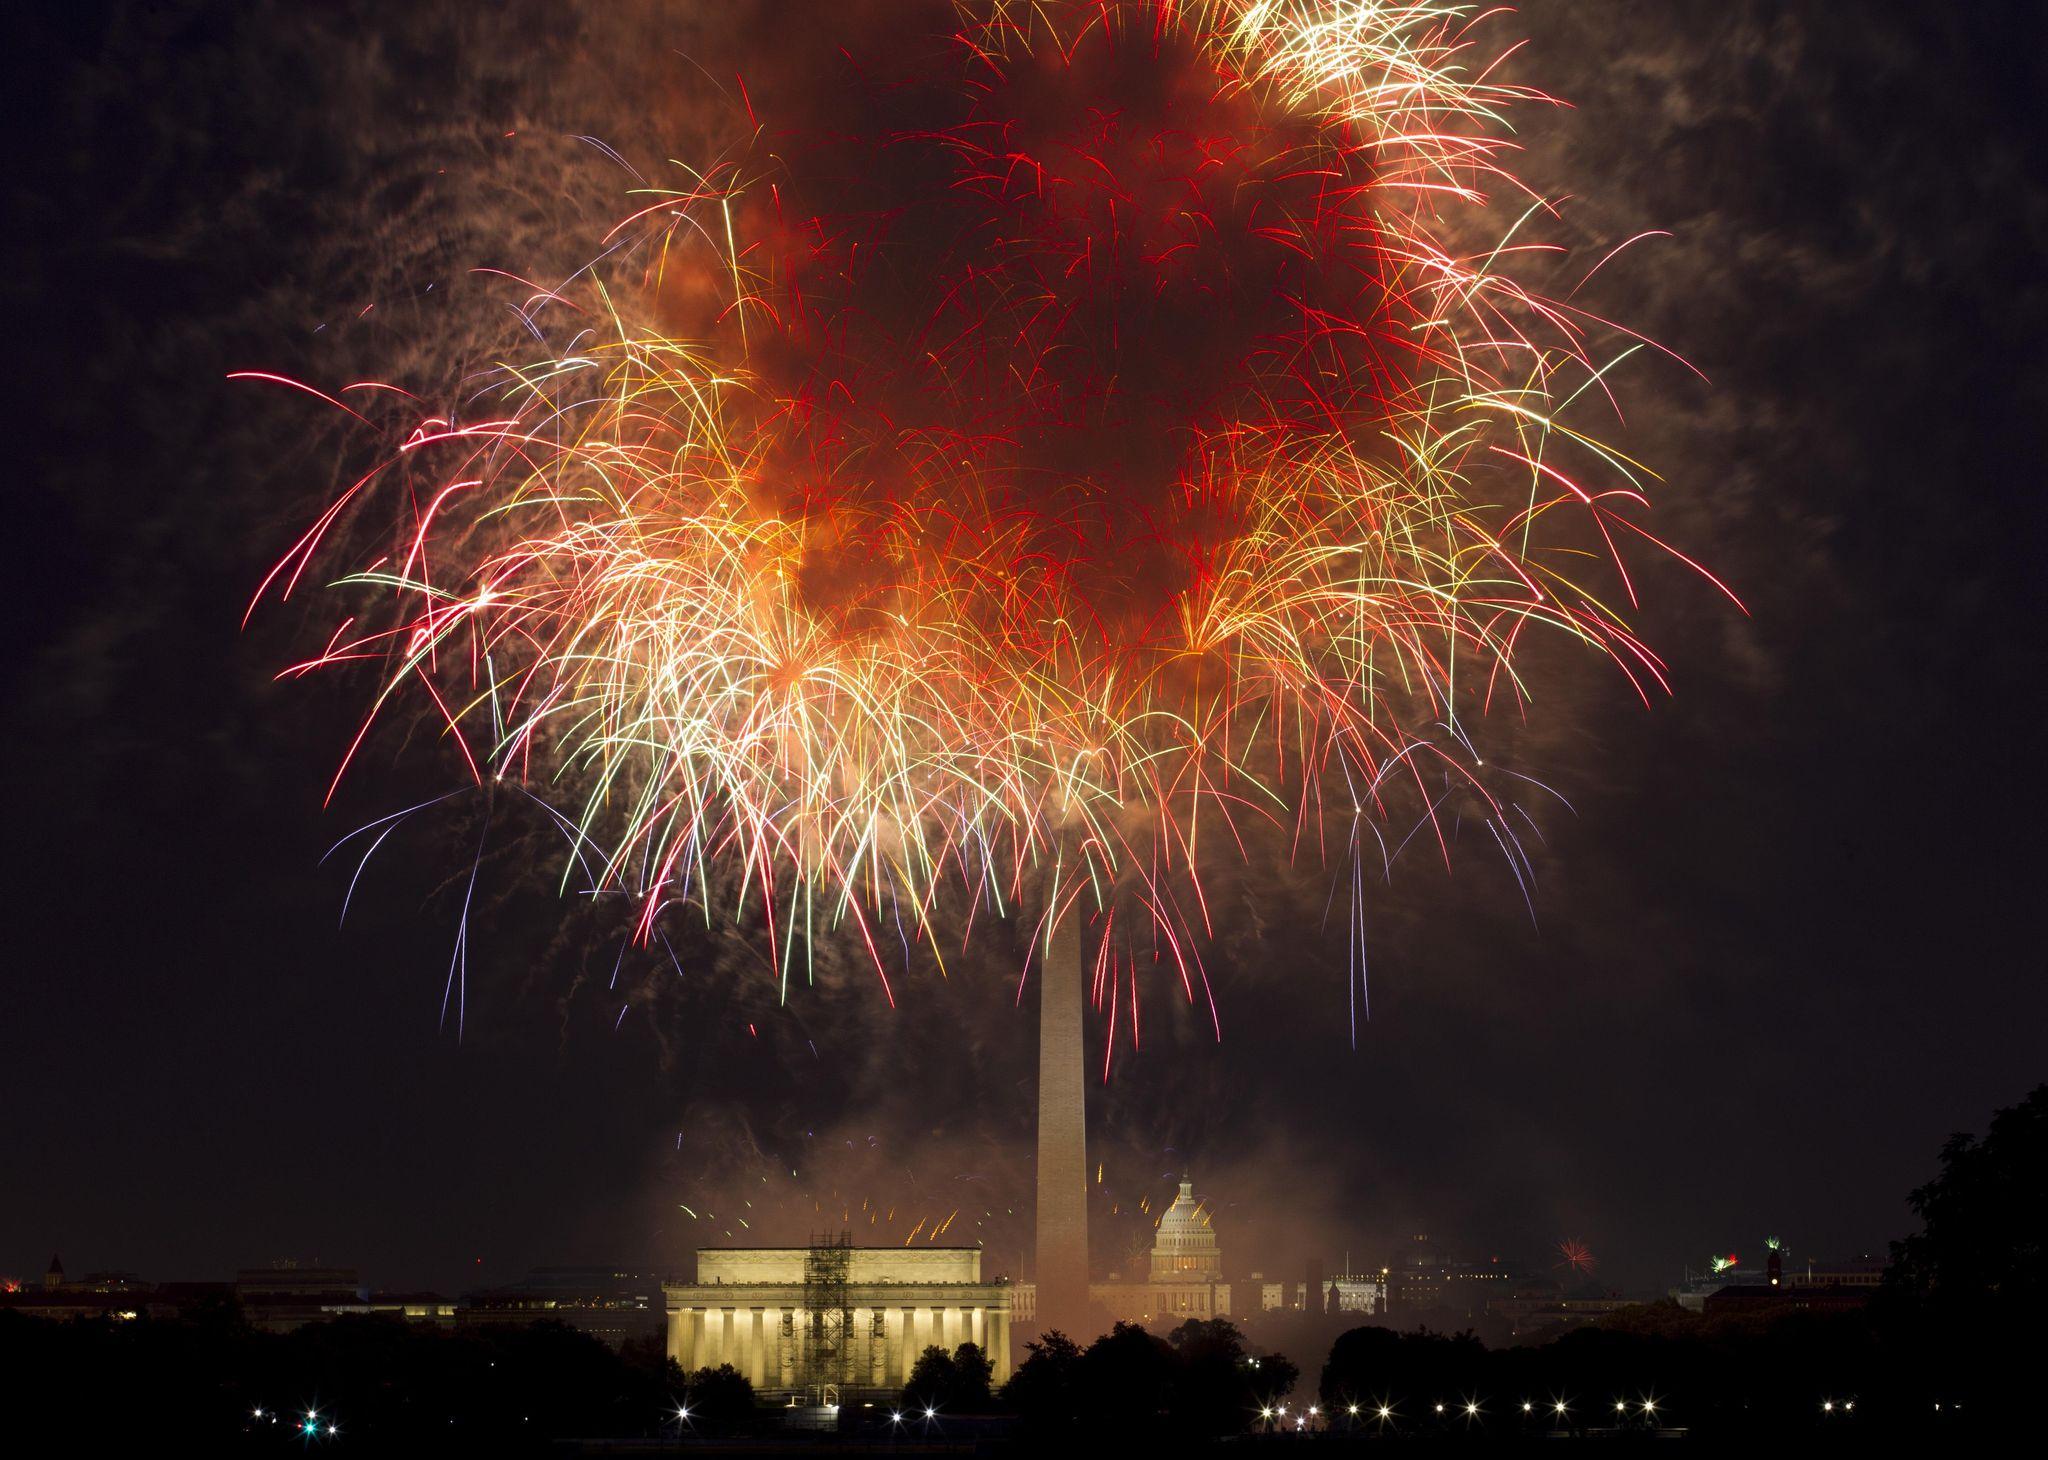 Freedom, liberty and America's birthday